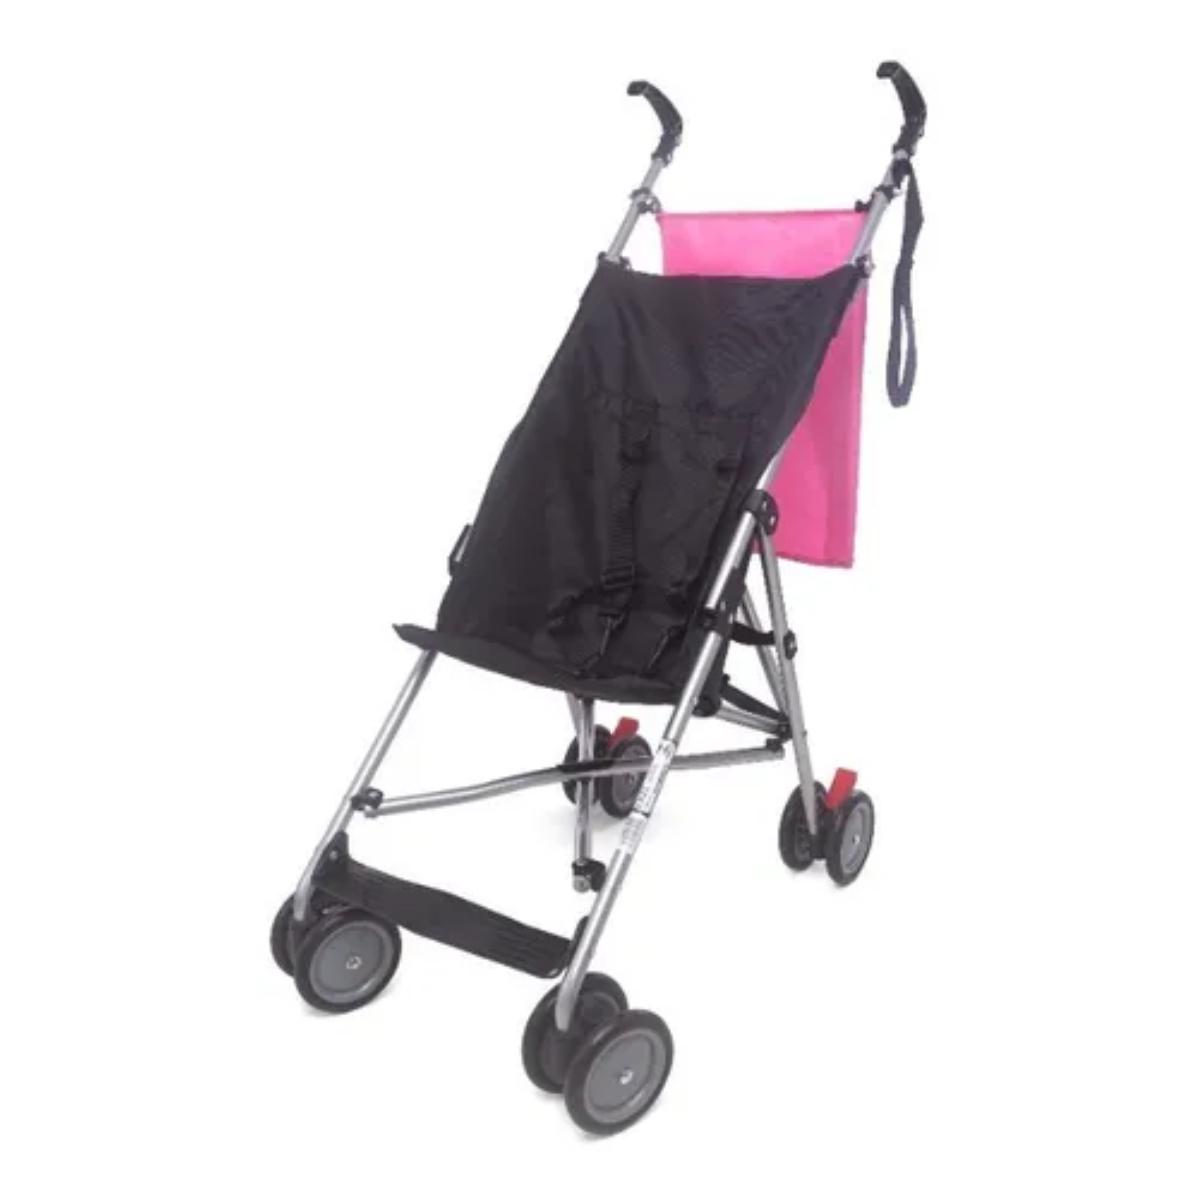 Carrinho Bebê Passeio Compacto Cool Baby Style Rosa